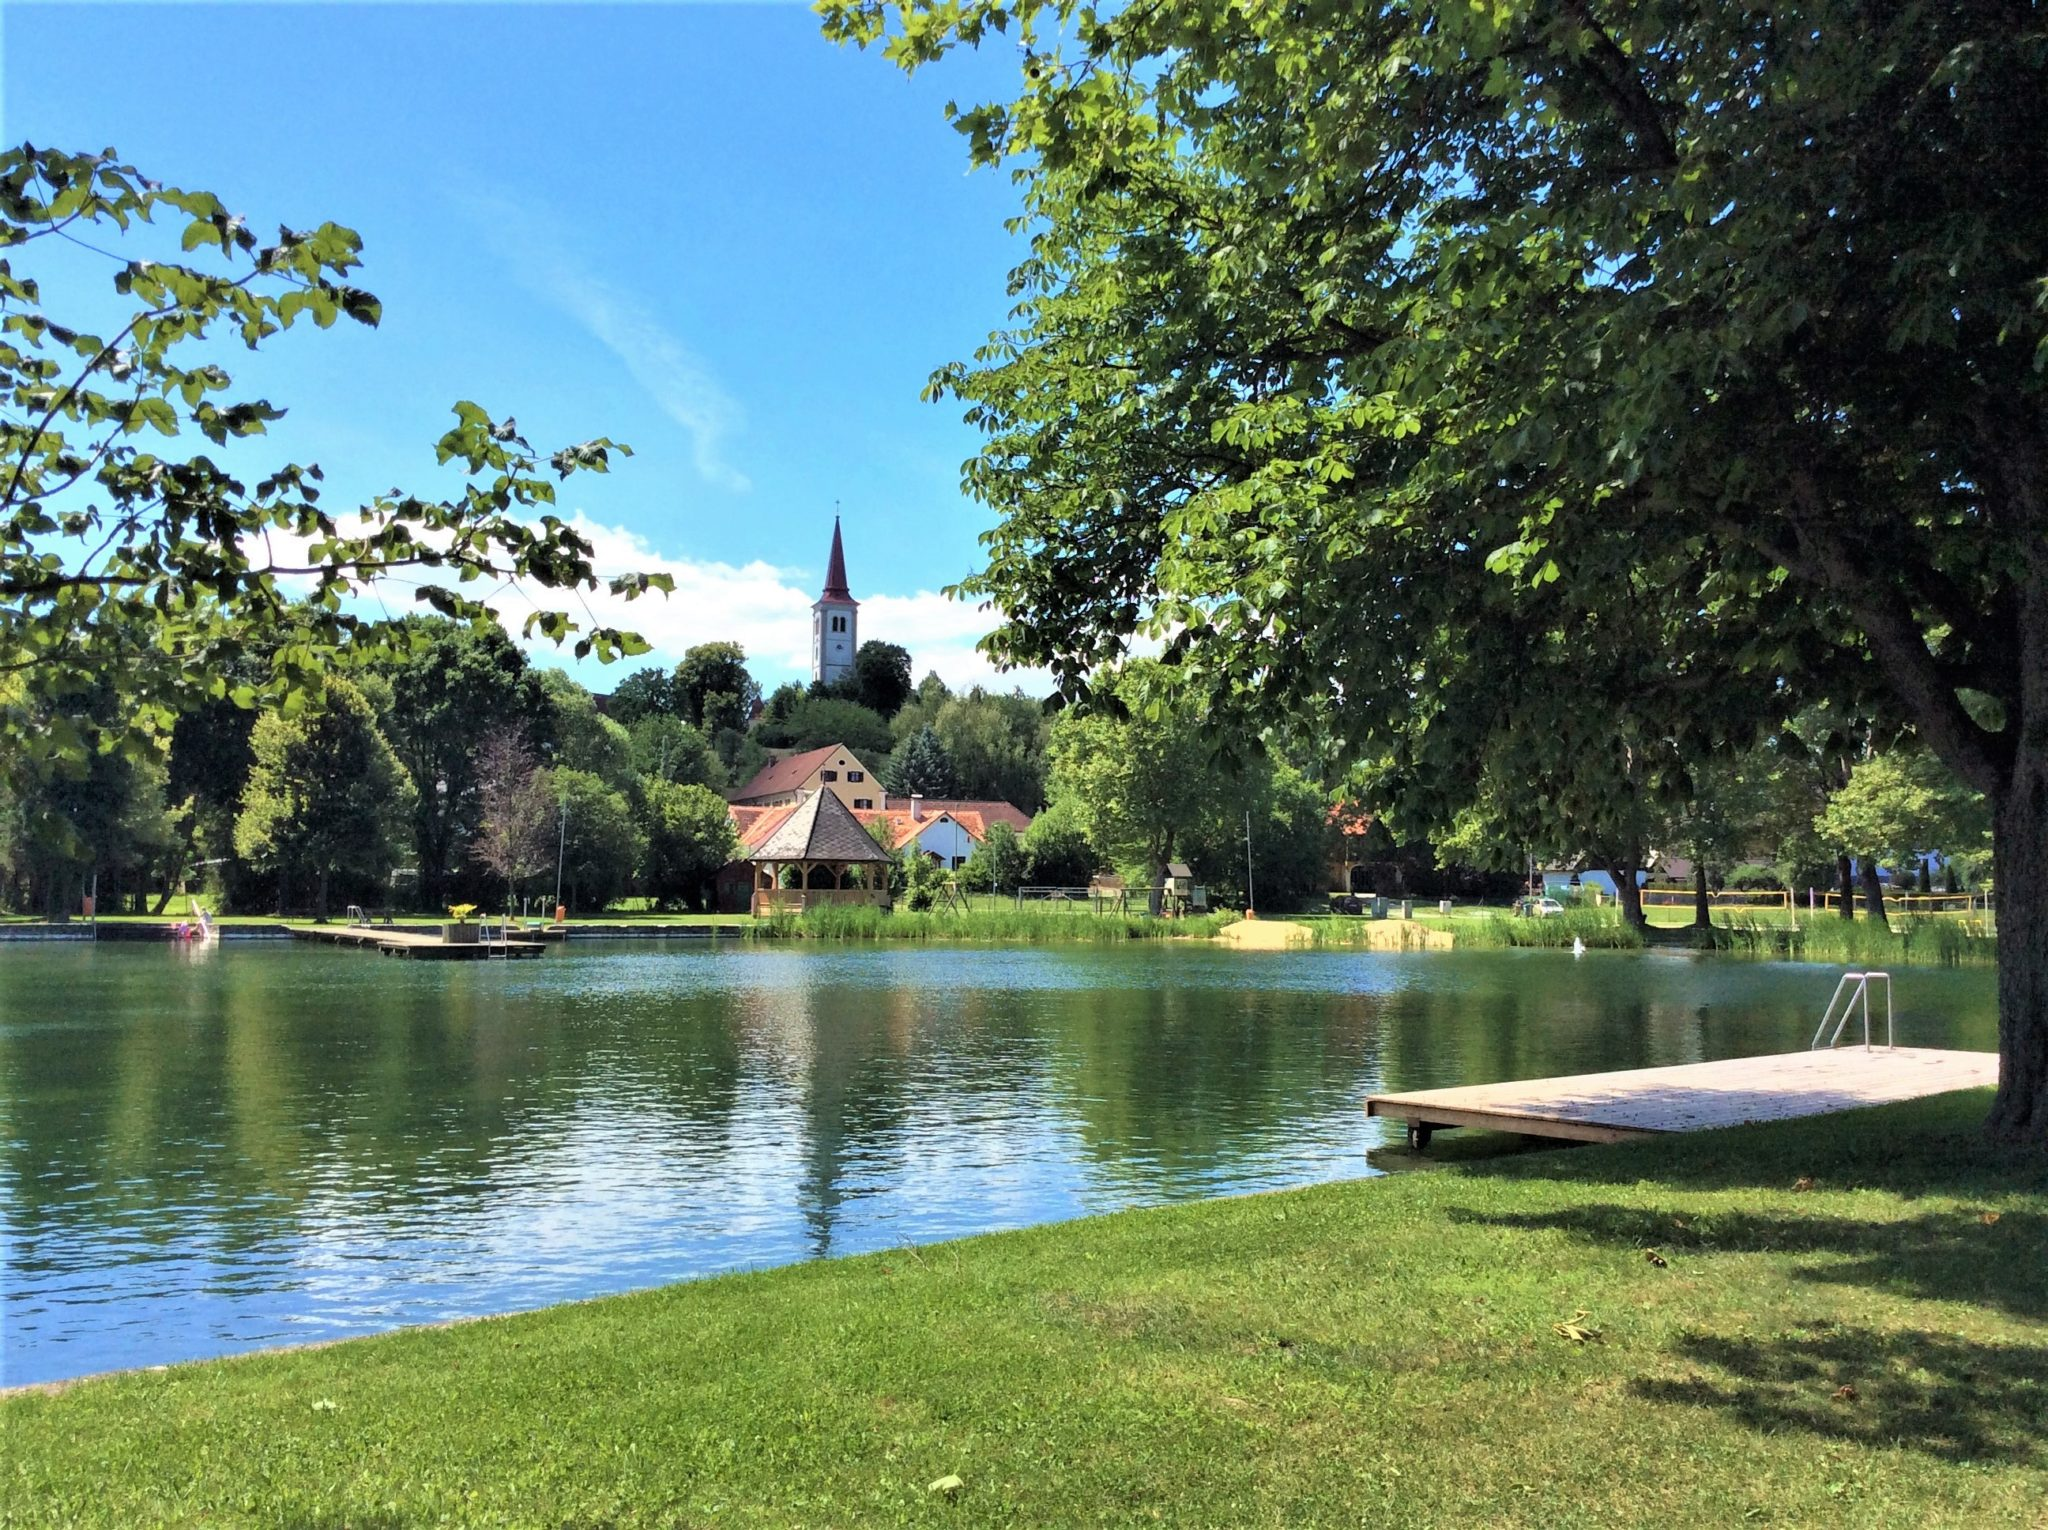 Ausflugsziel: Schlossbad Burgau